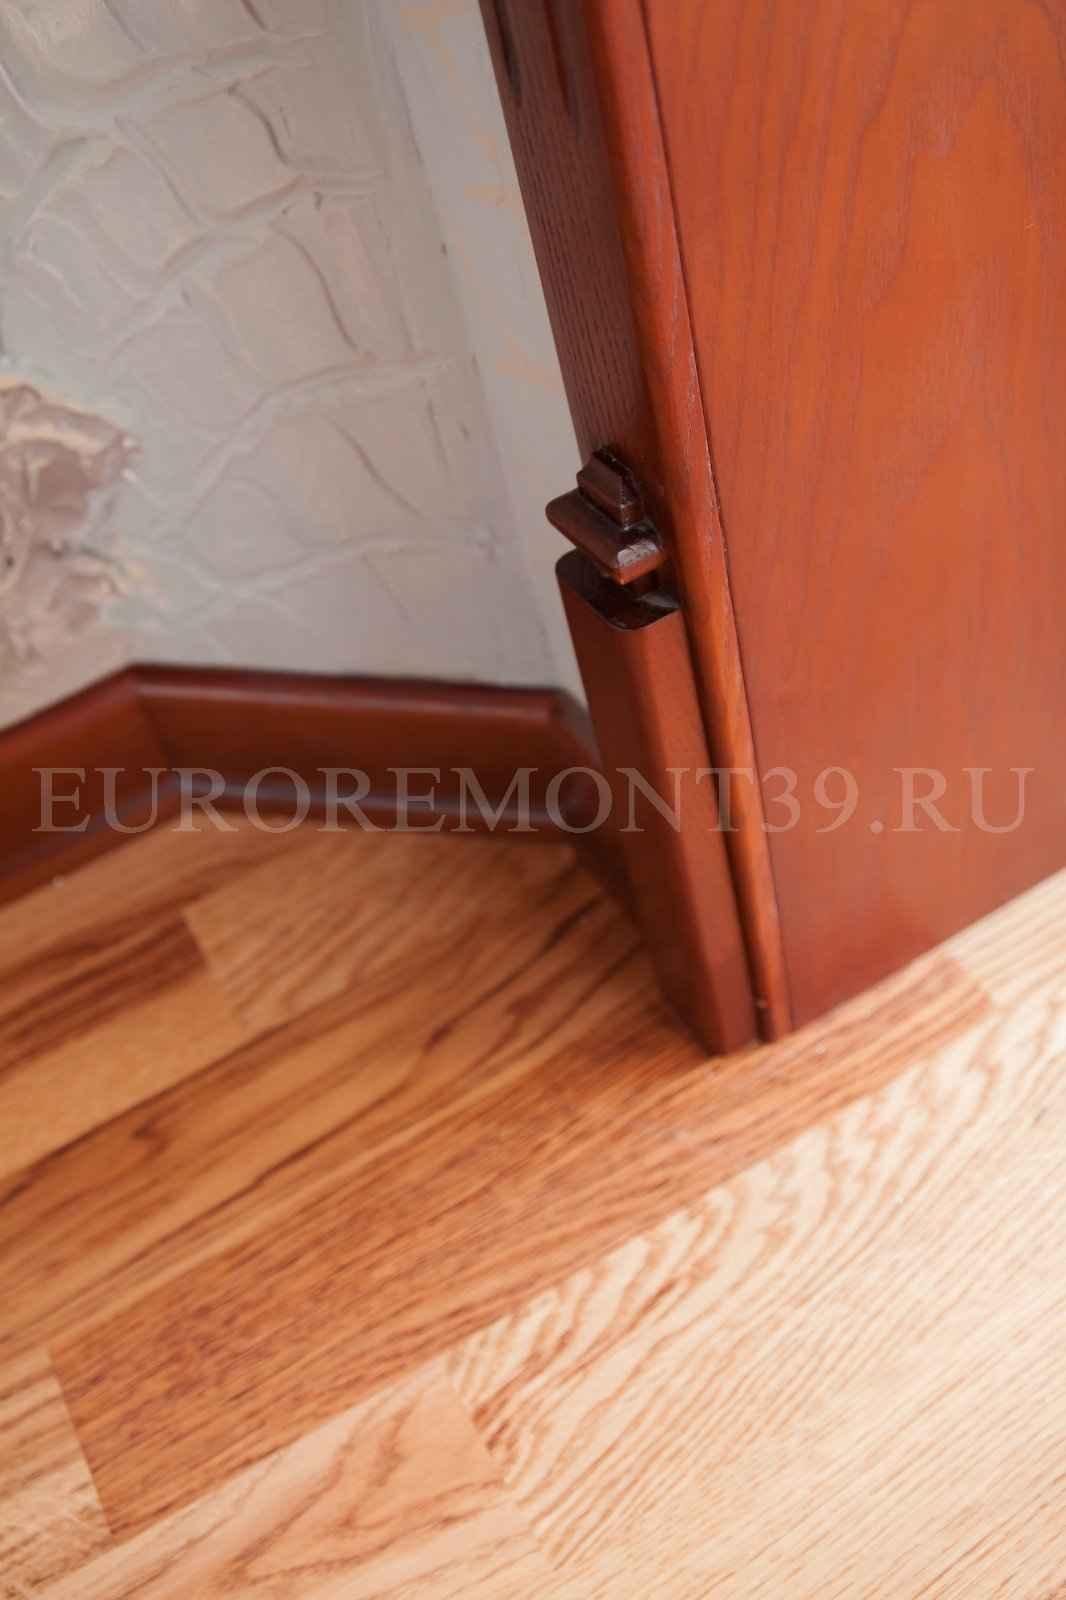 Ремонт квартир в Калининграде Тел. 8 (4012) 76-07-97